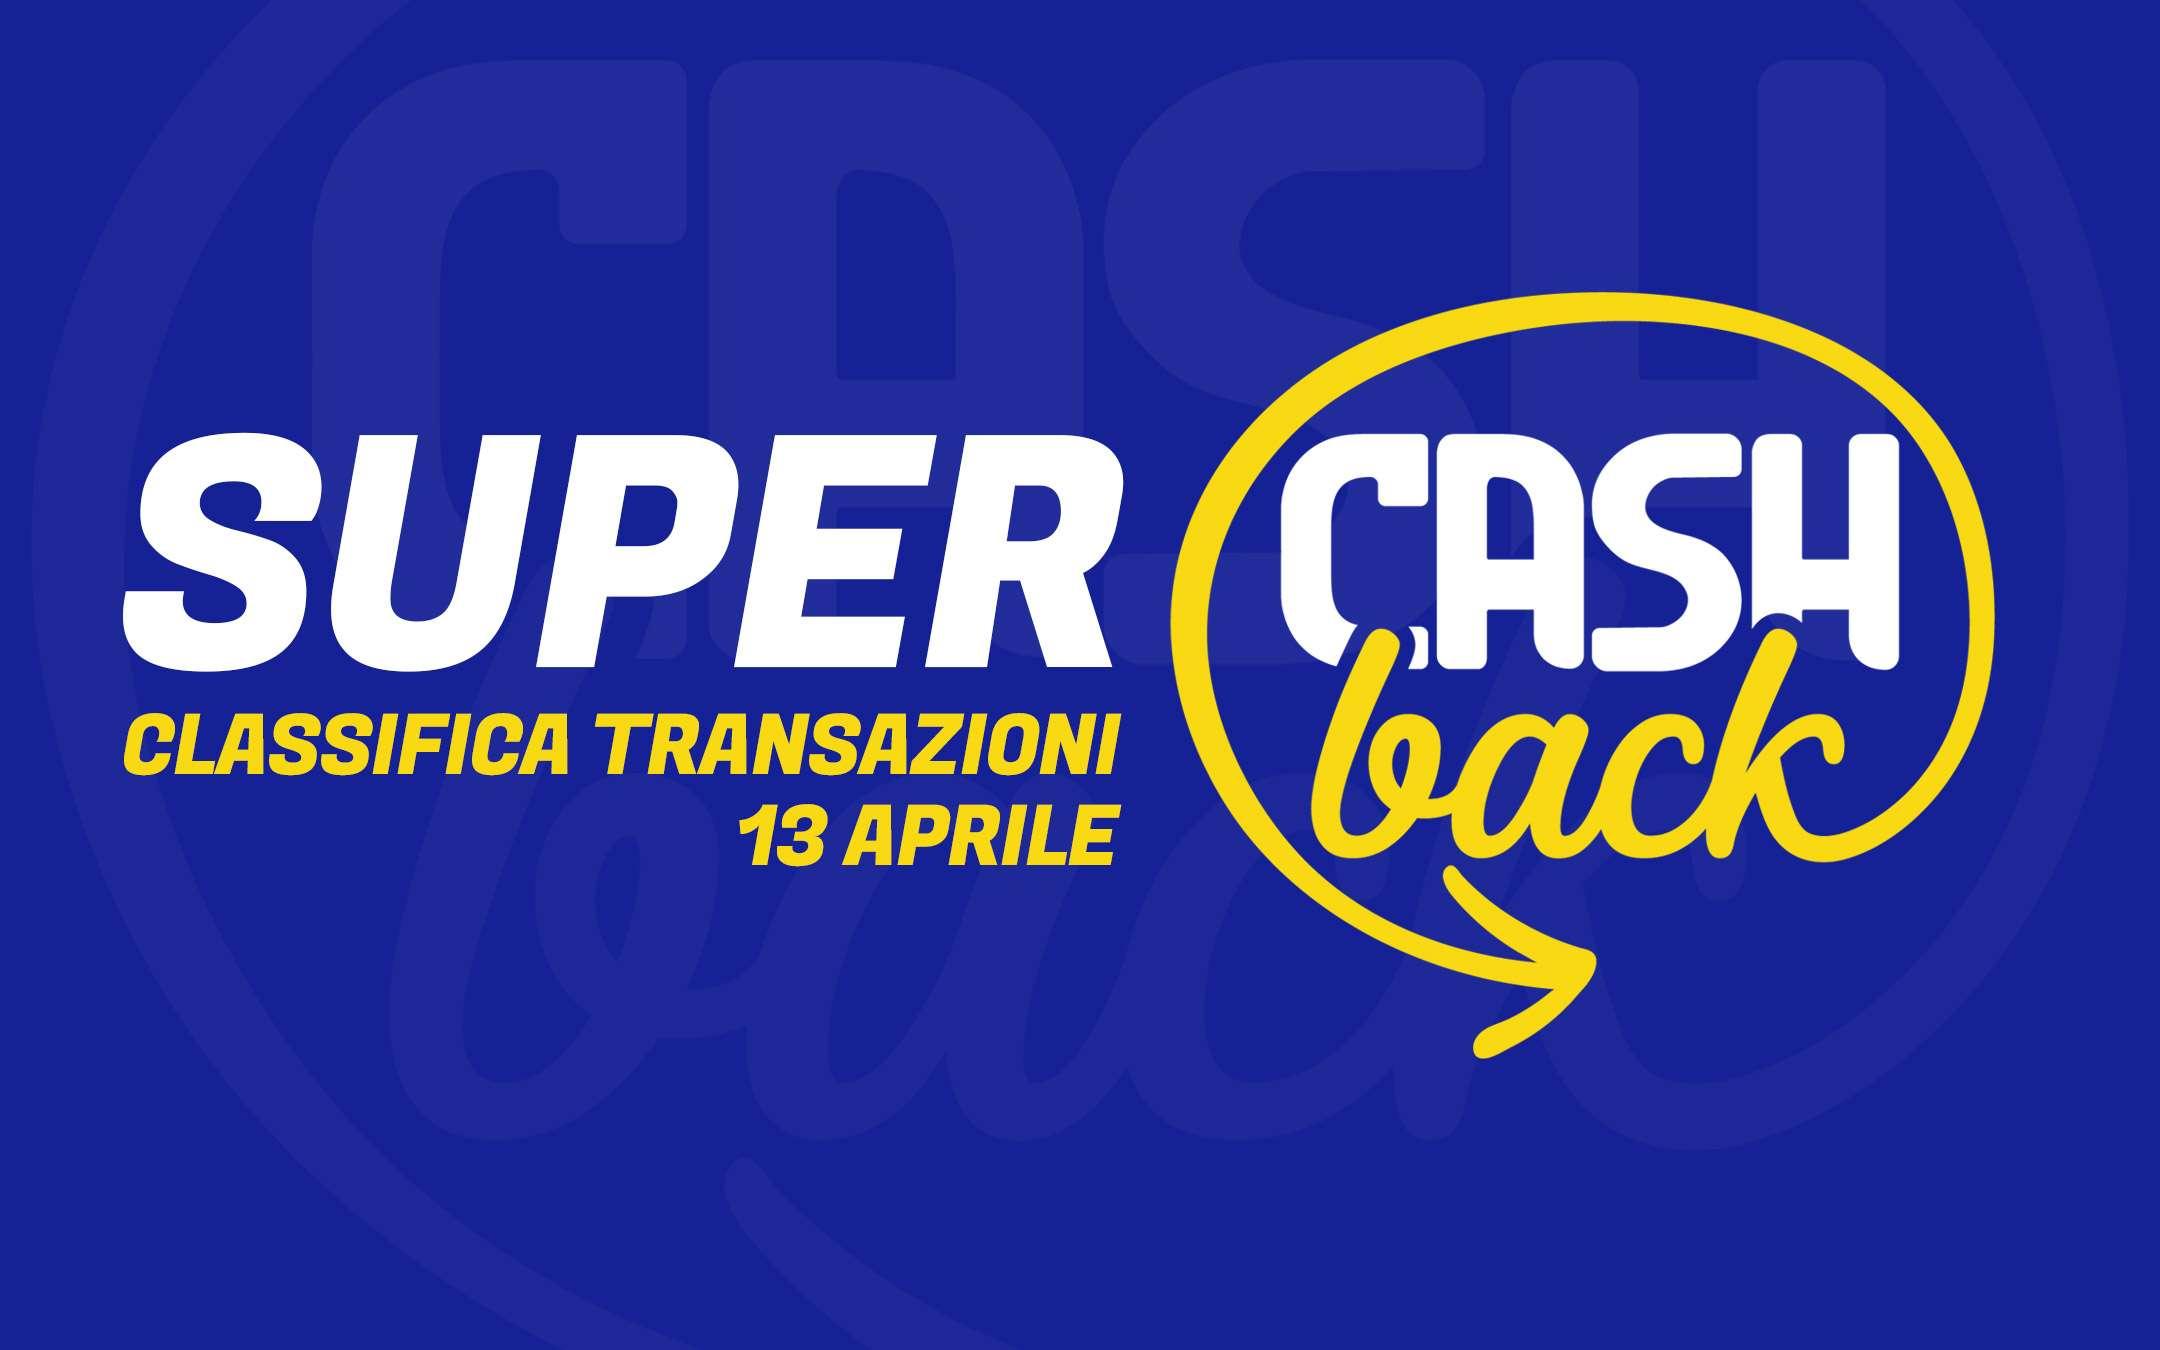 Super Cashback: classifica transazioni, 13 aprile